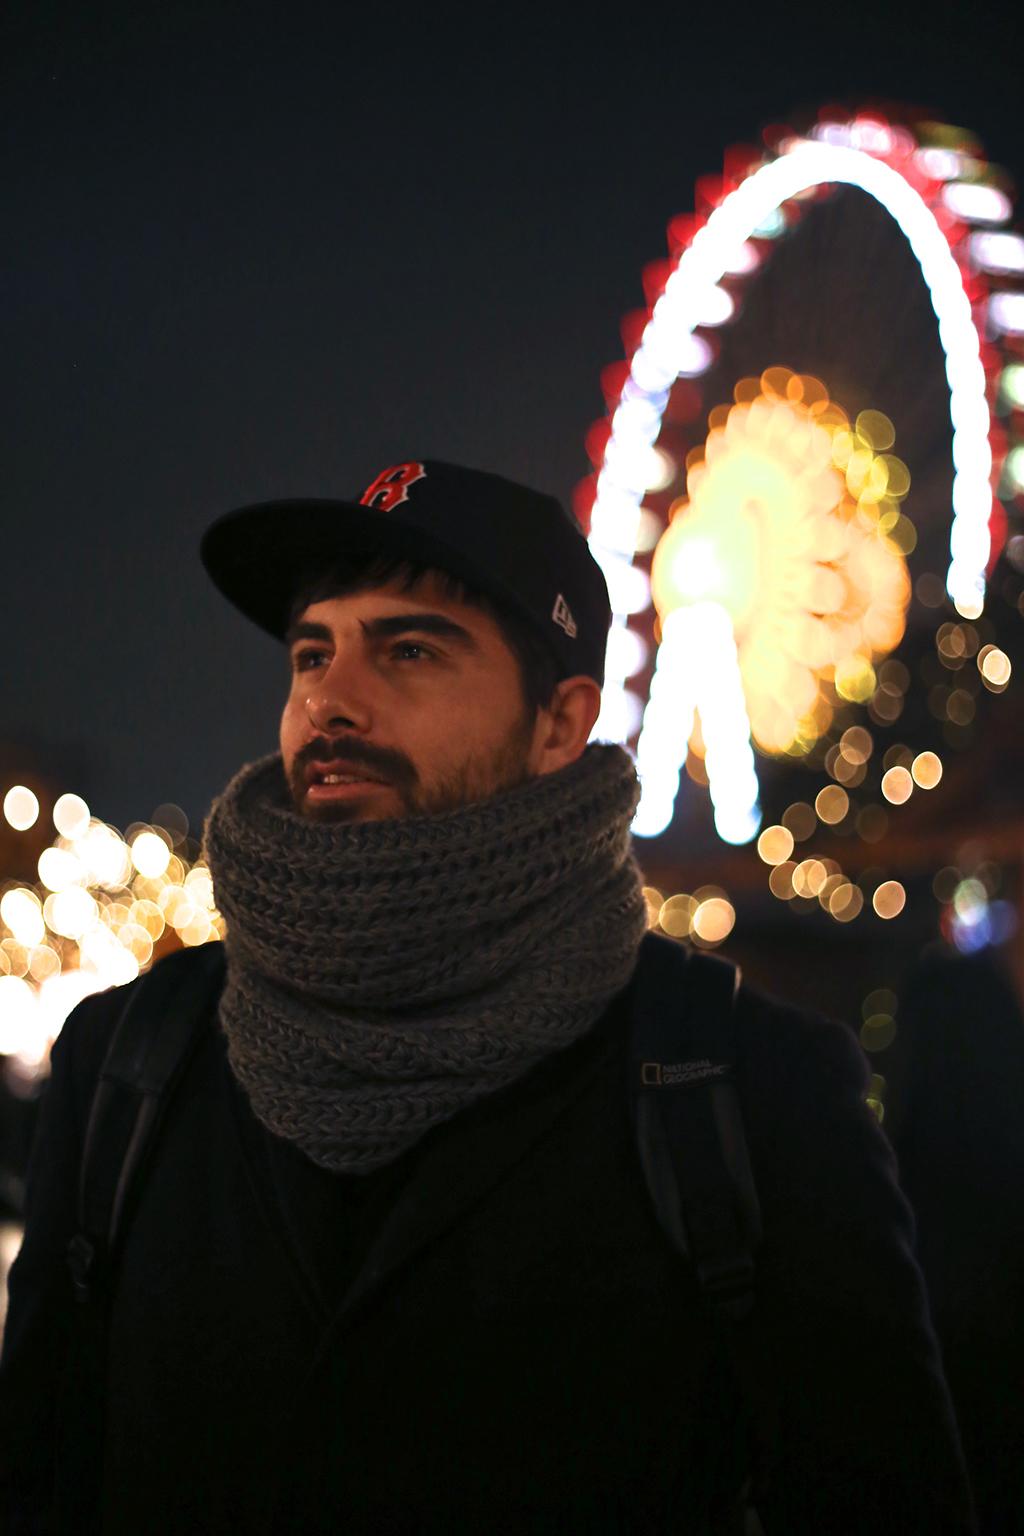 bow-tie-blue-alexanderplatz-christmas_9